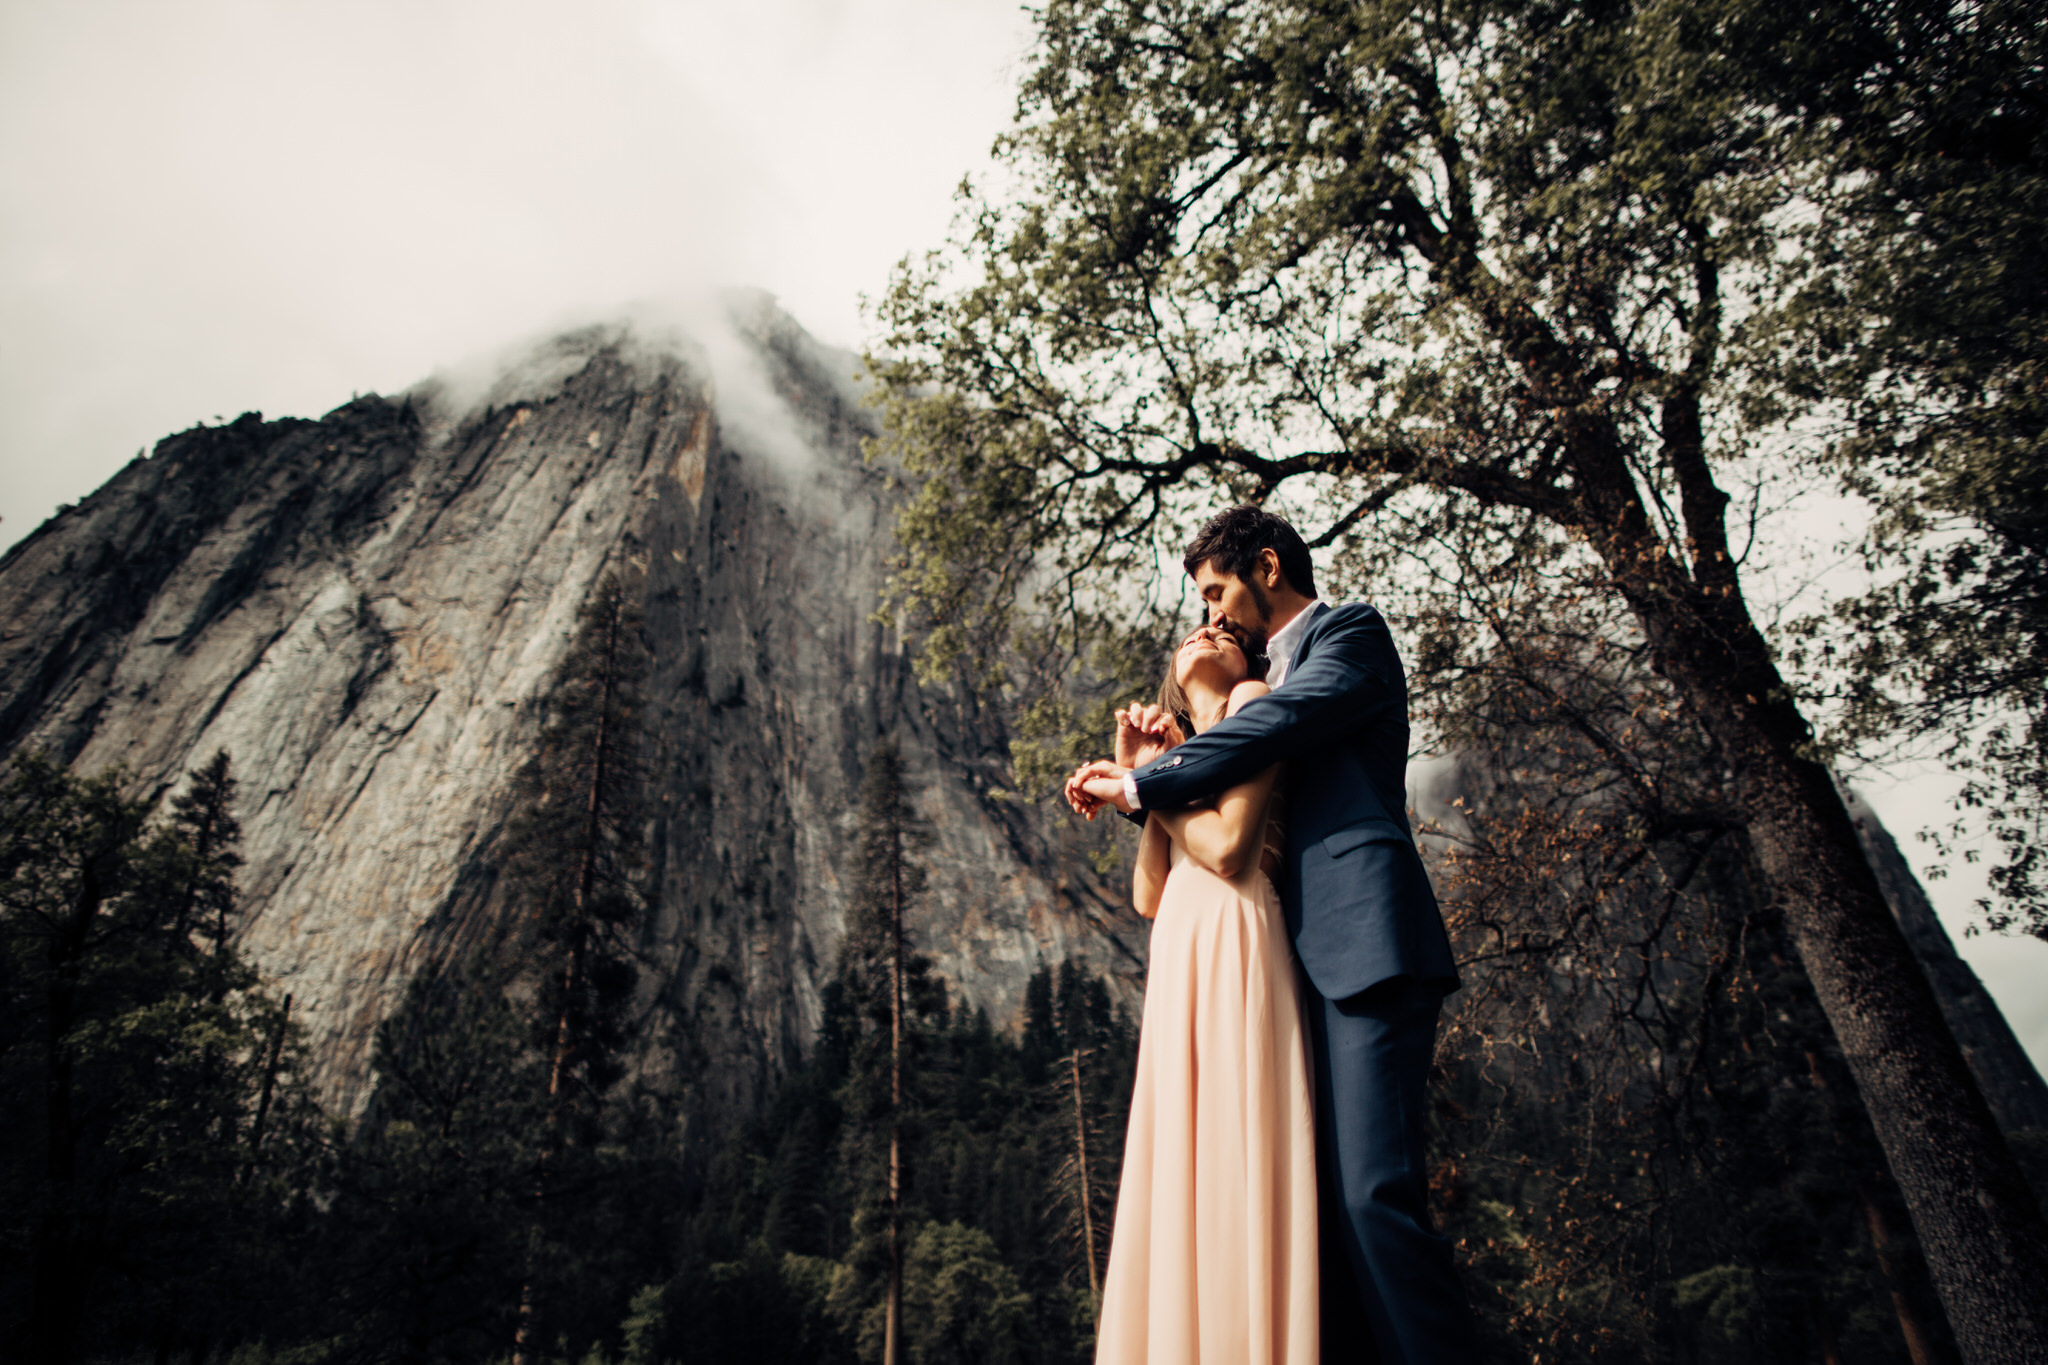 Yosemite-engagement-session-lauren-and-tom78.jpg